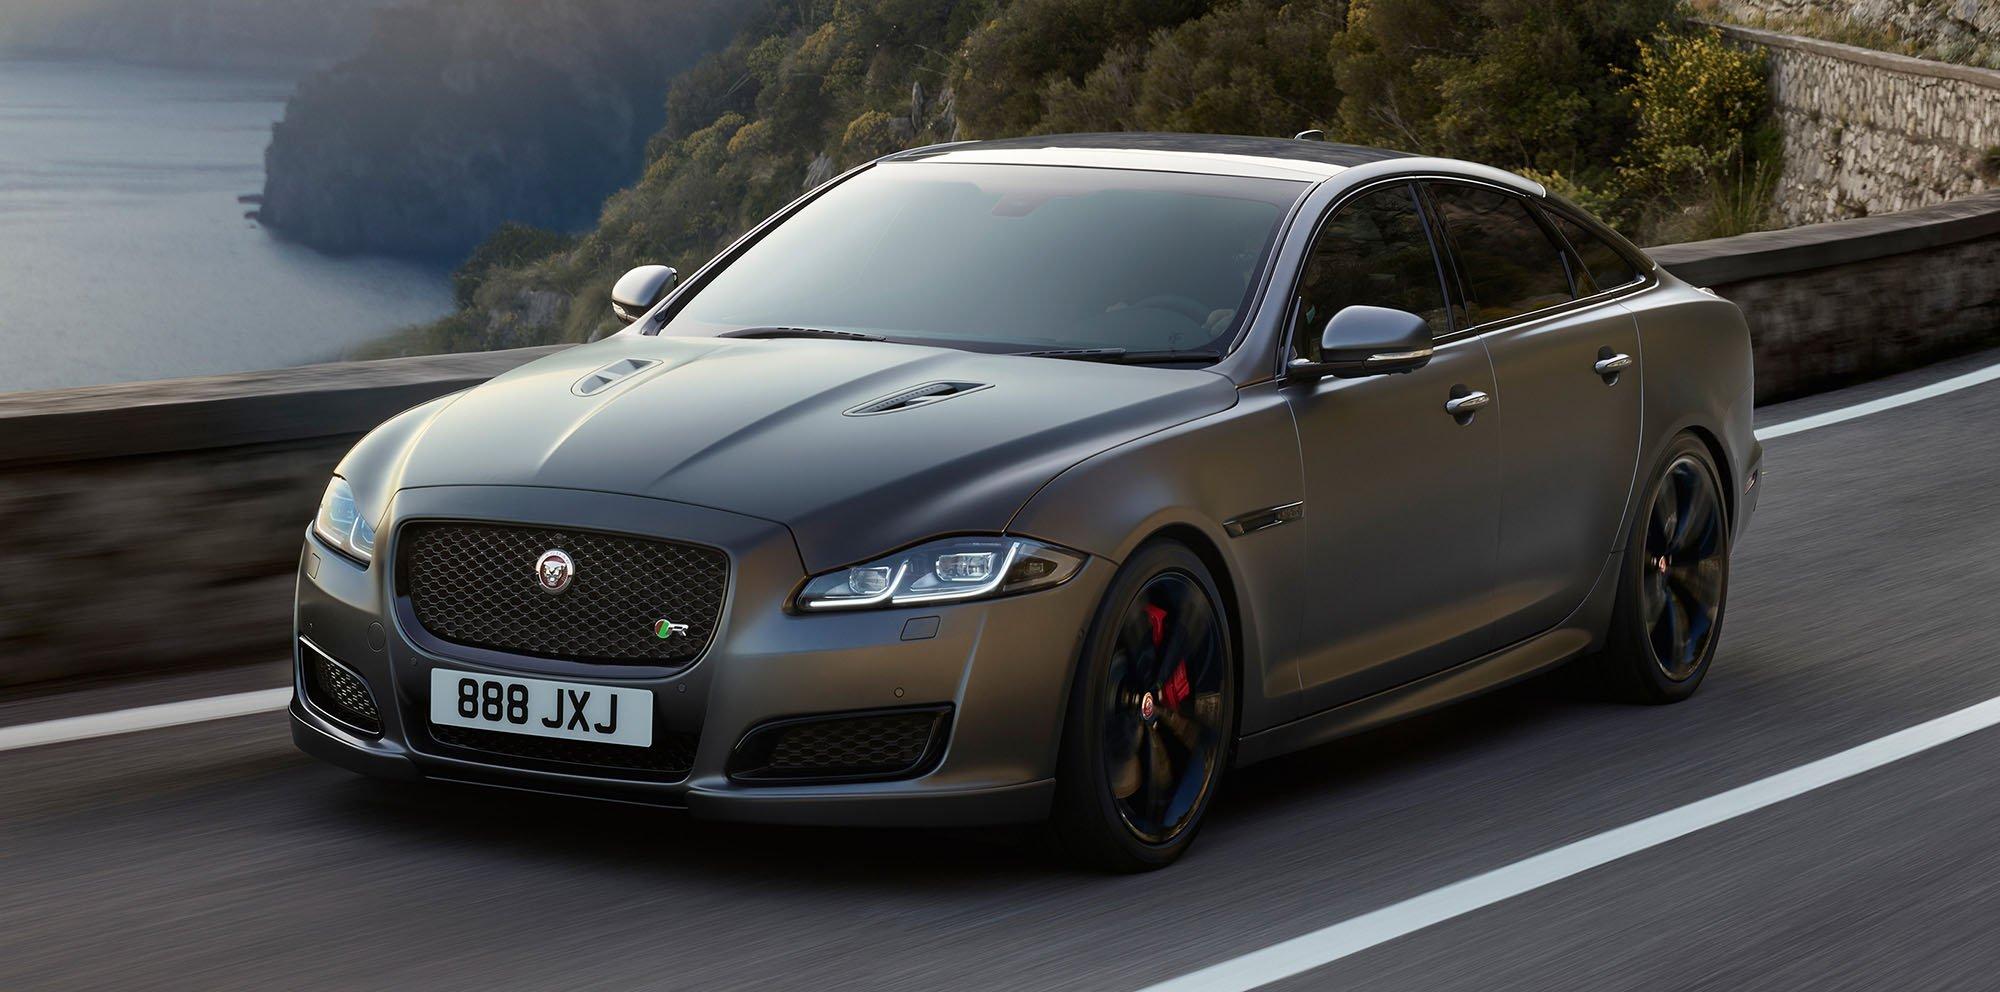 2018 Jaguar Xjr575 Headlines Updated Range Australian